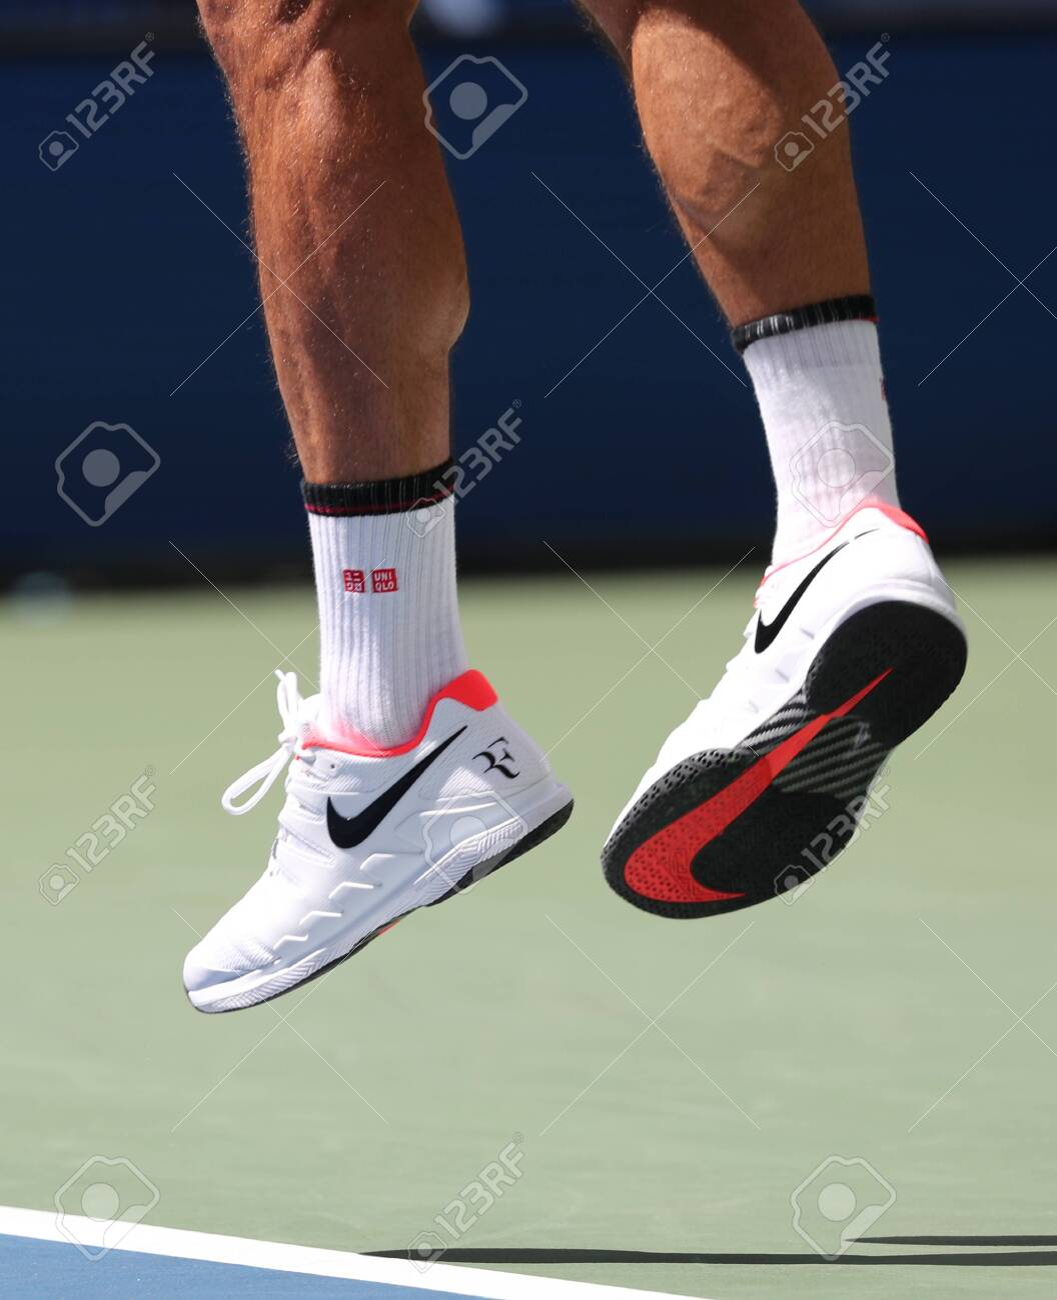 2019: 20-time Grand Slam Champion Roger